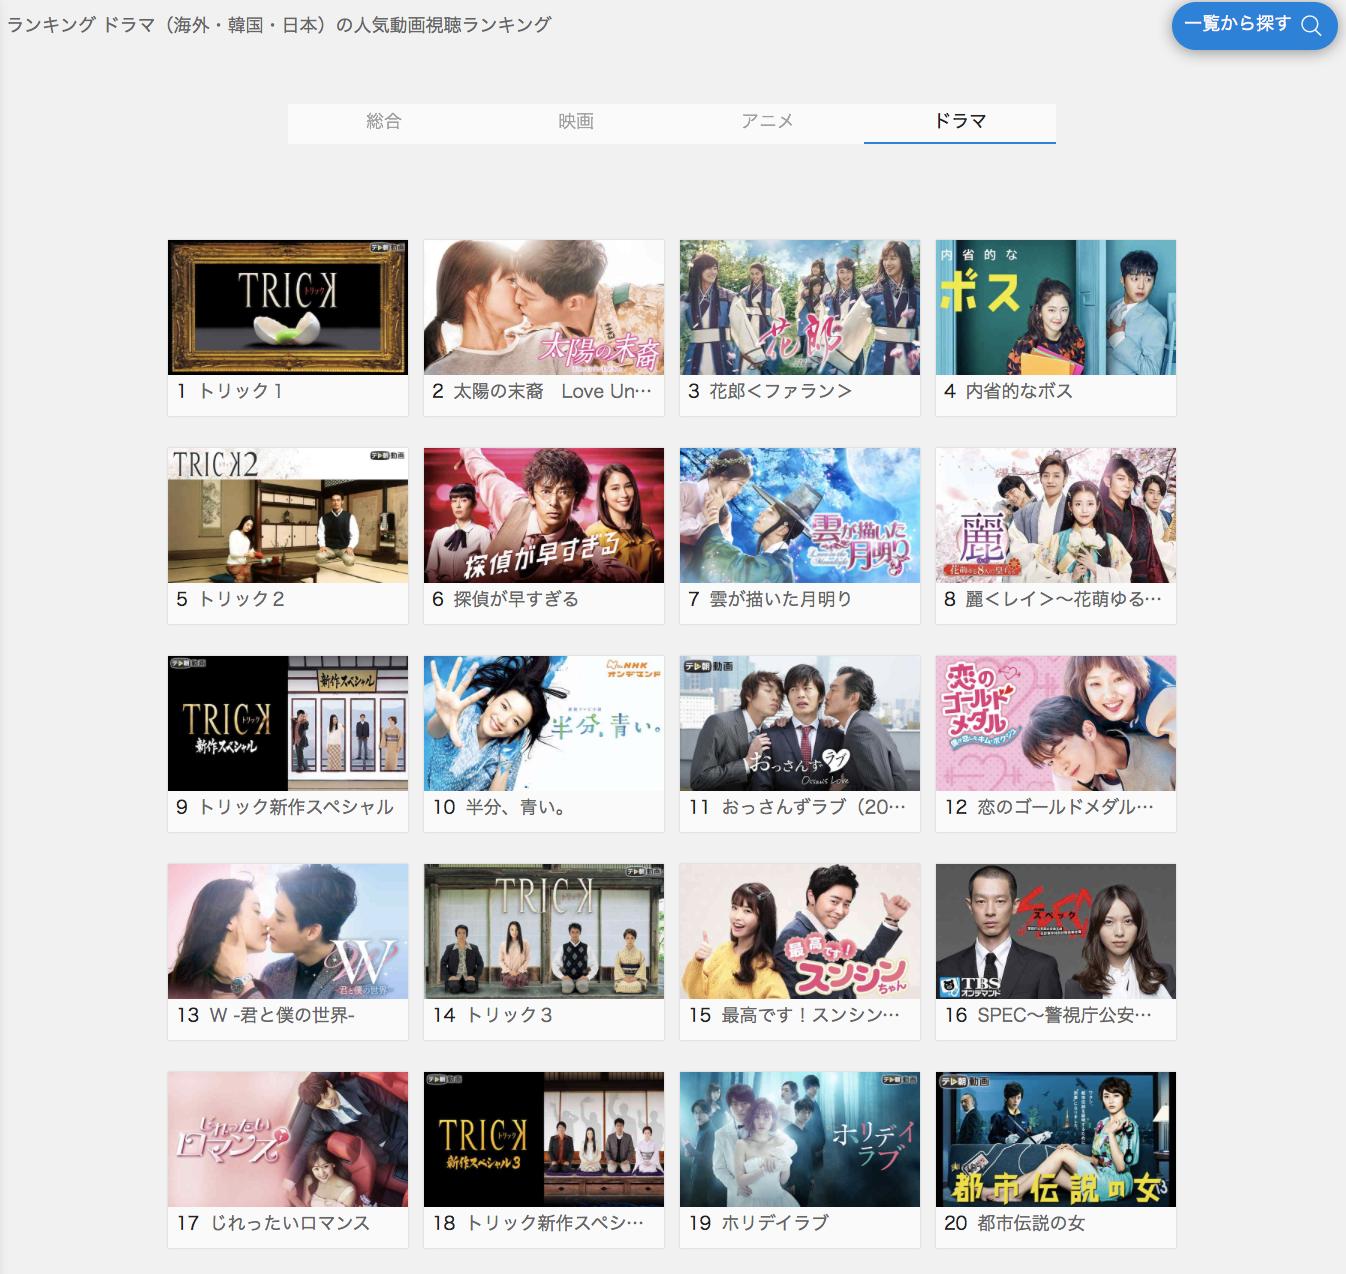 U-NEXT(ユーネクスト)の韓国(韓流)ドラマでおすすめの人気ランキングとは?